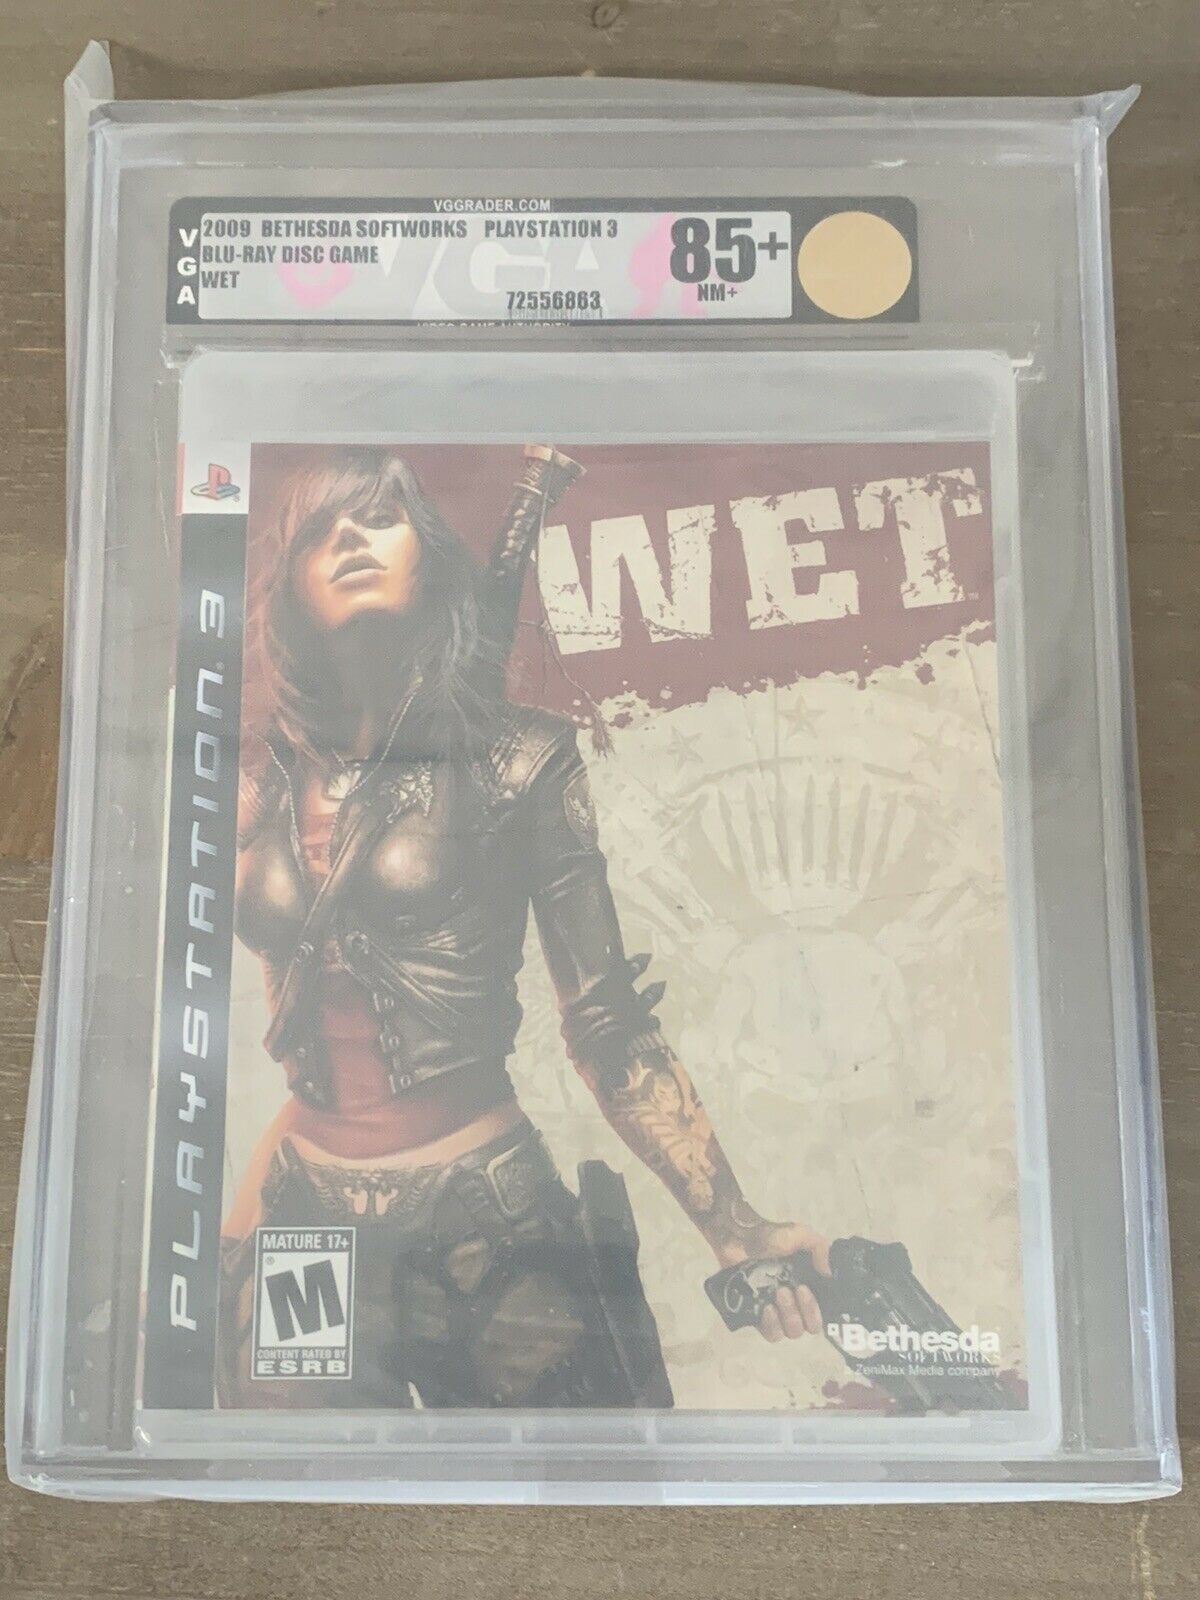 2009 Wet Sony Playstation 3 PS3 New Sealed Graded VGA 85+ Gore